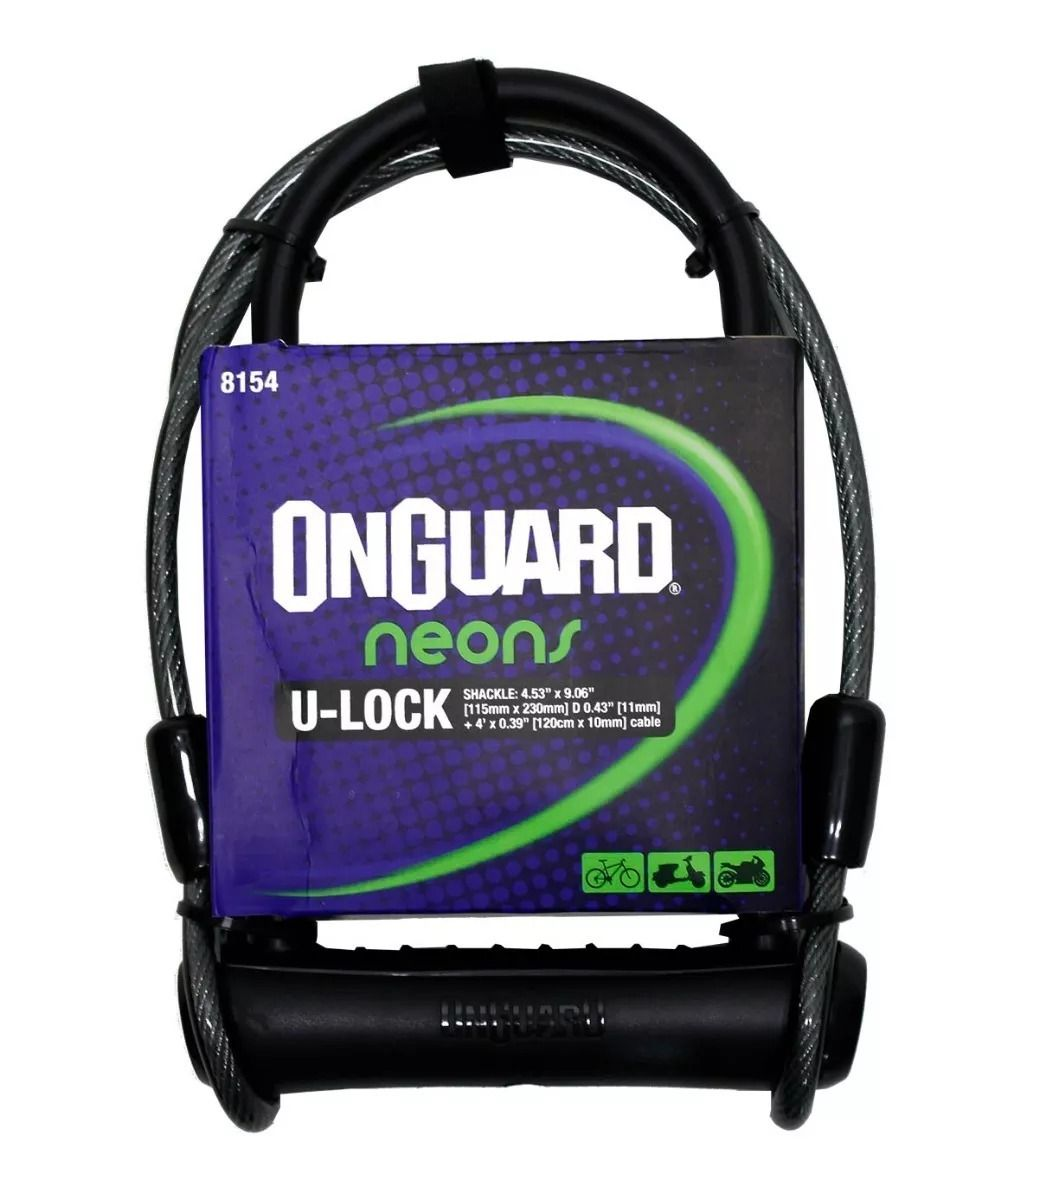 Cadeado Onguard Neon U-Lock 8154